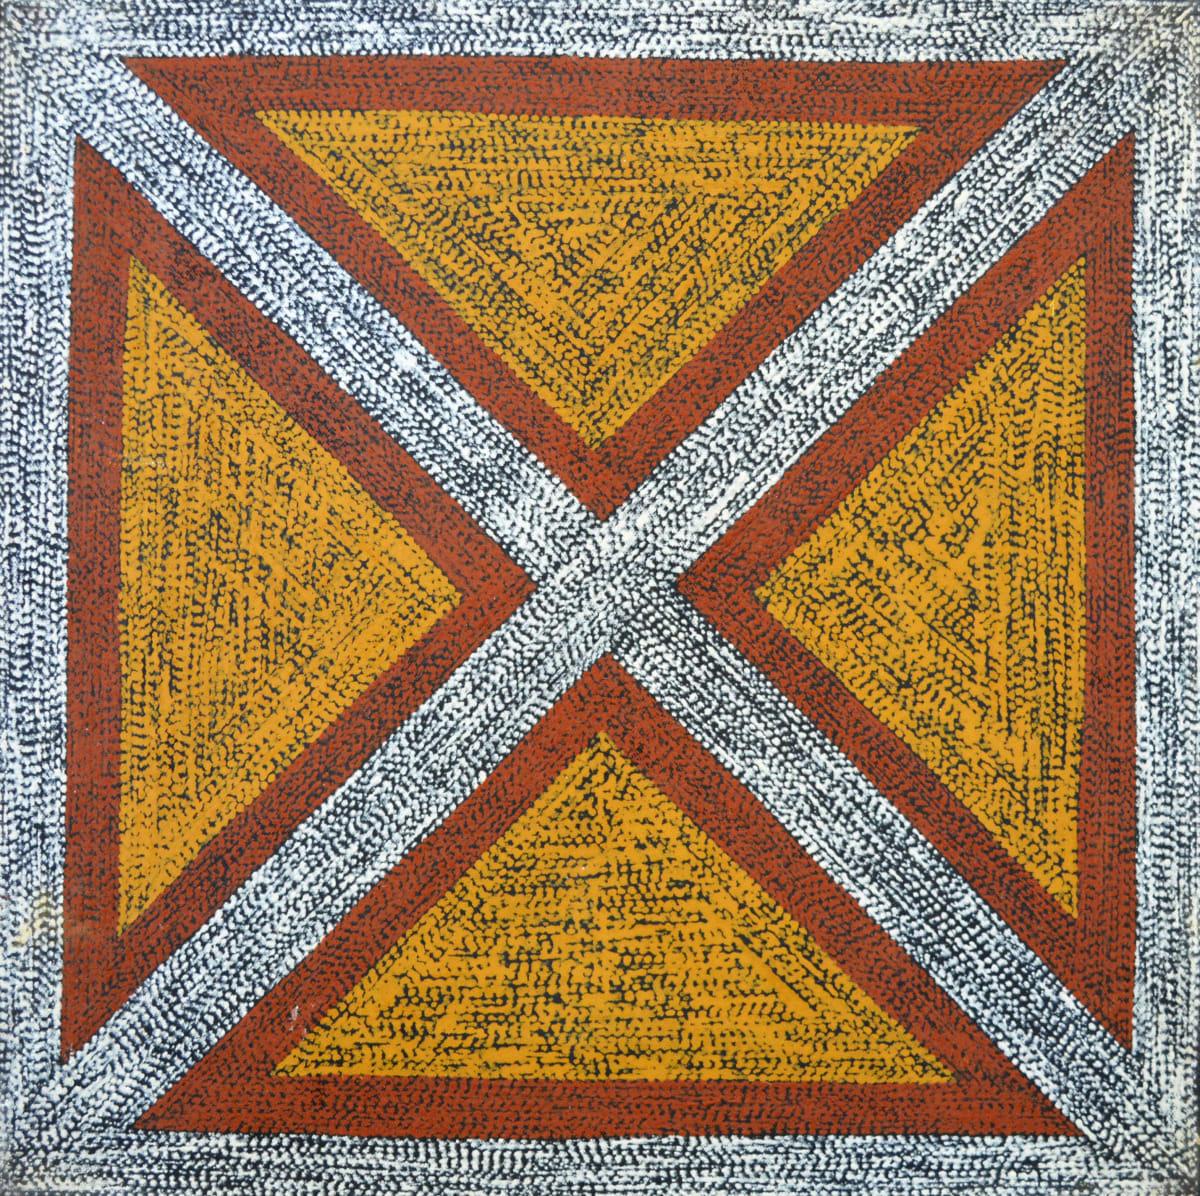 Barbara Puruntatameri Parlini Jilamara (old design) natural ochres on canvas 45 x 45 cm